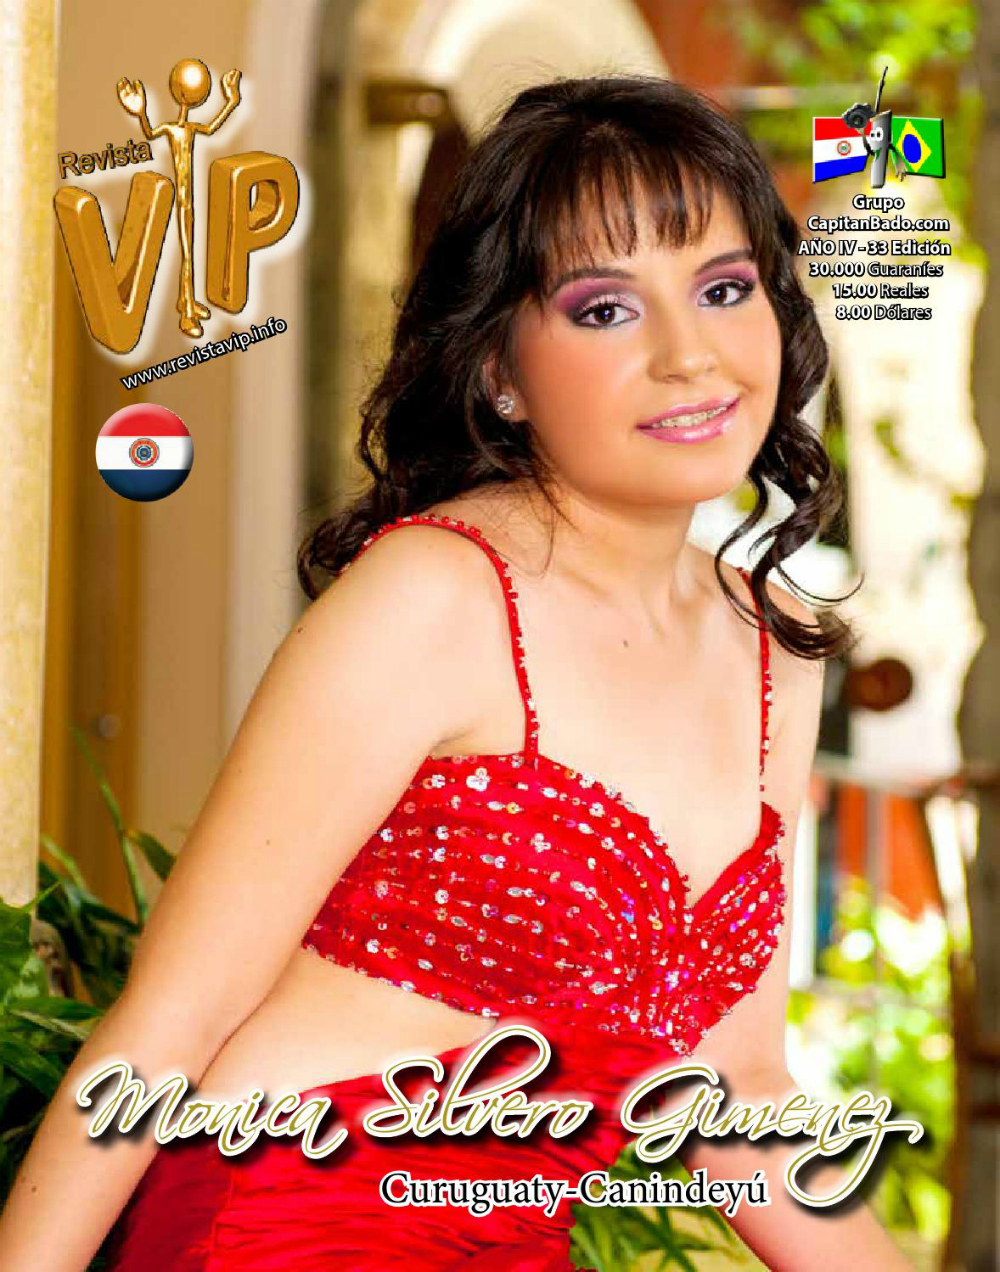 Vip 33 Paraguay